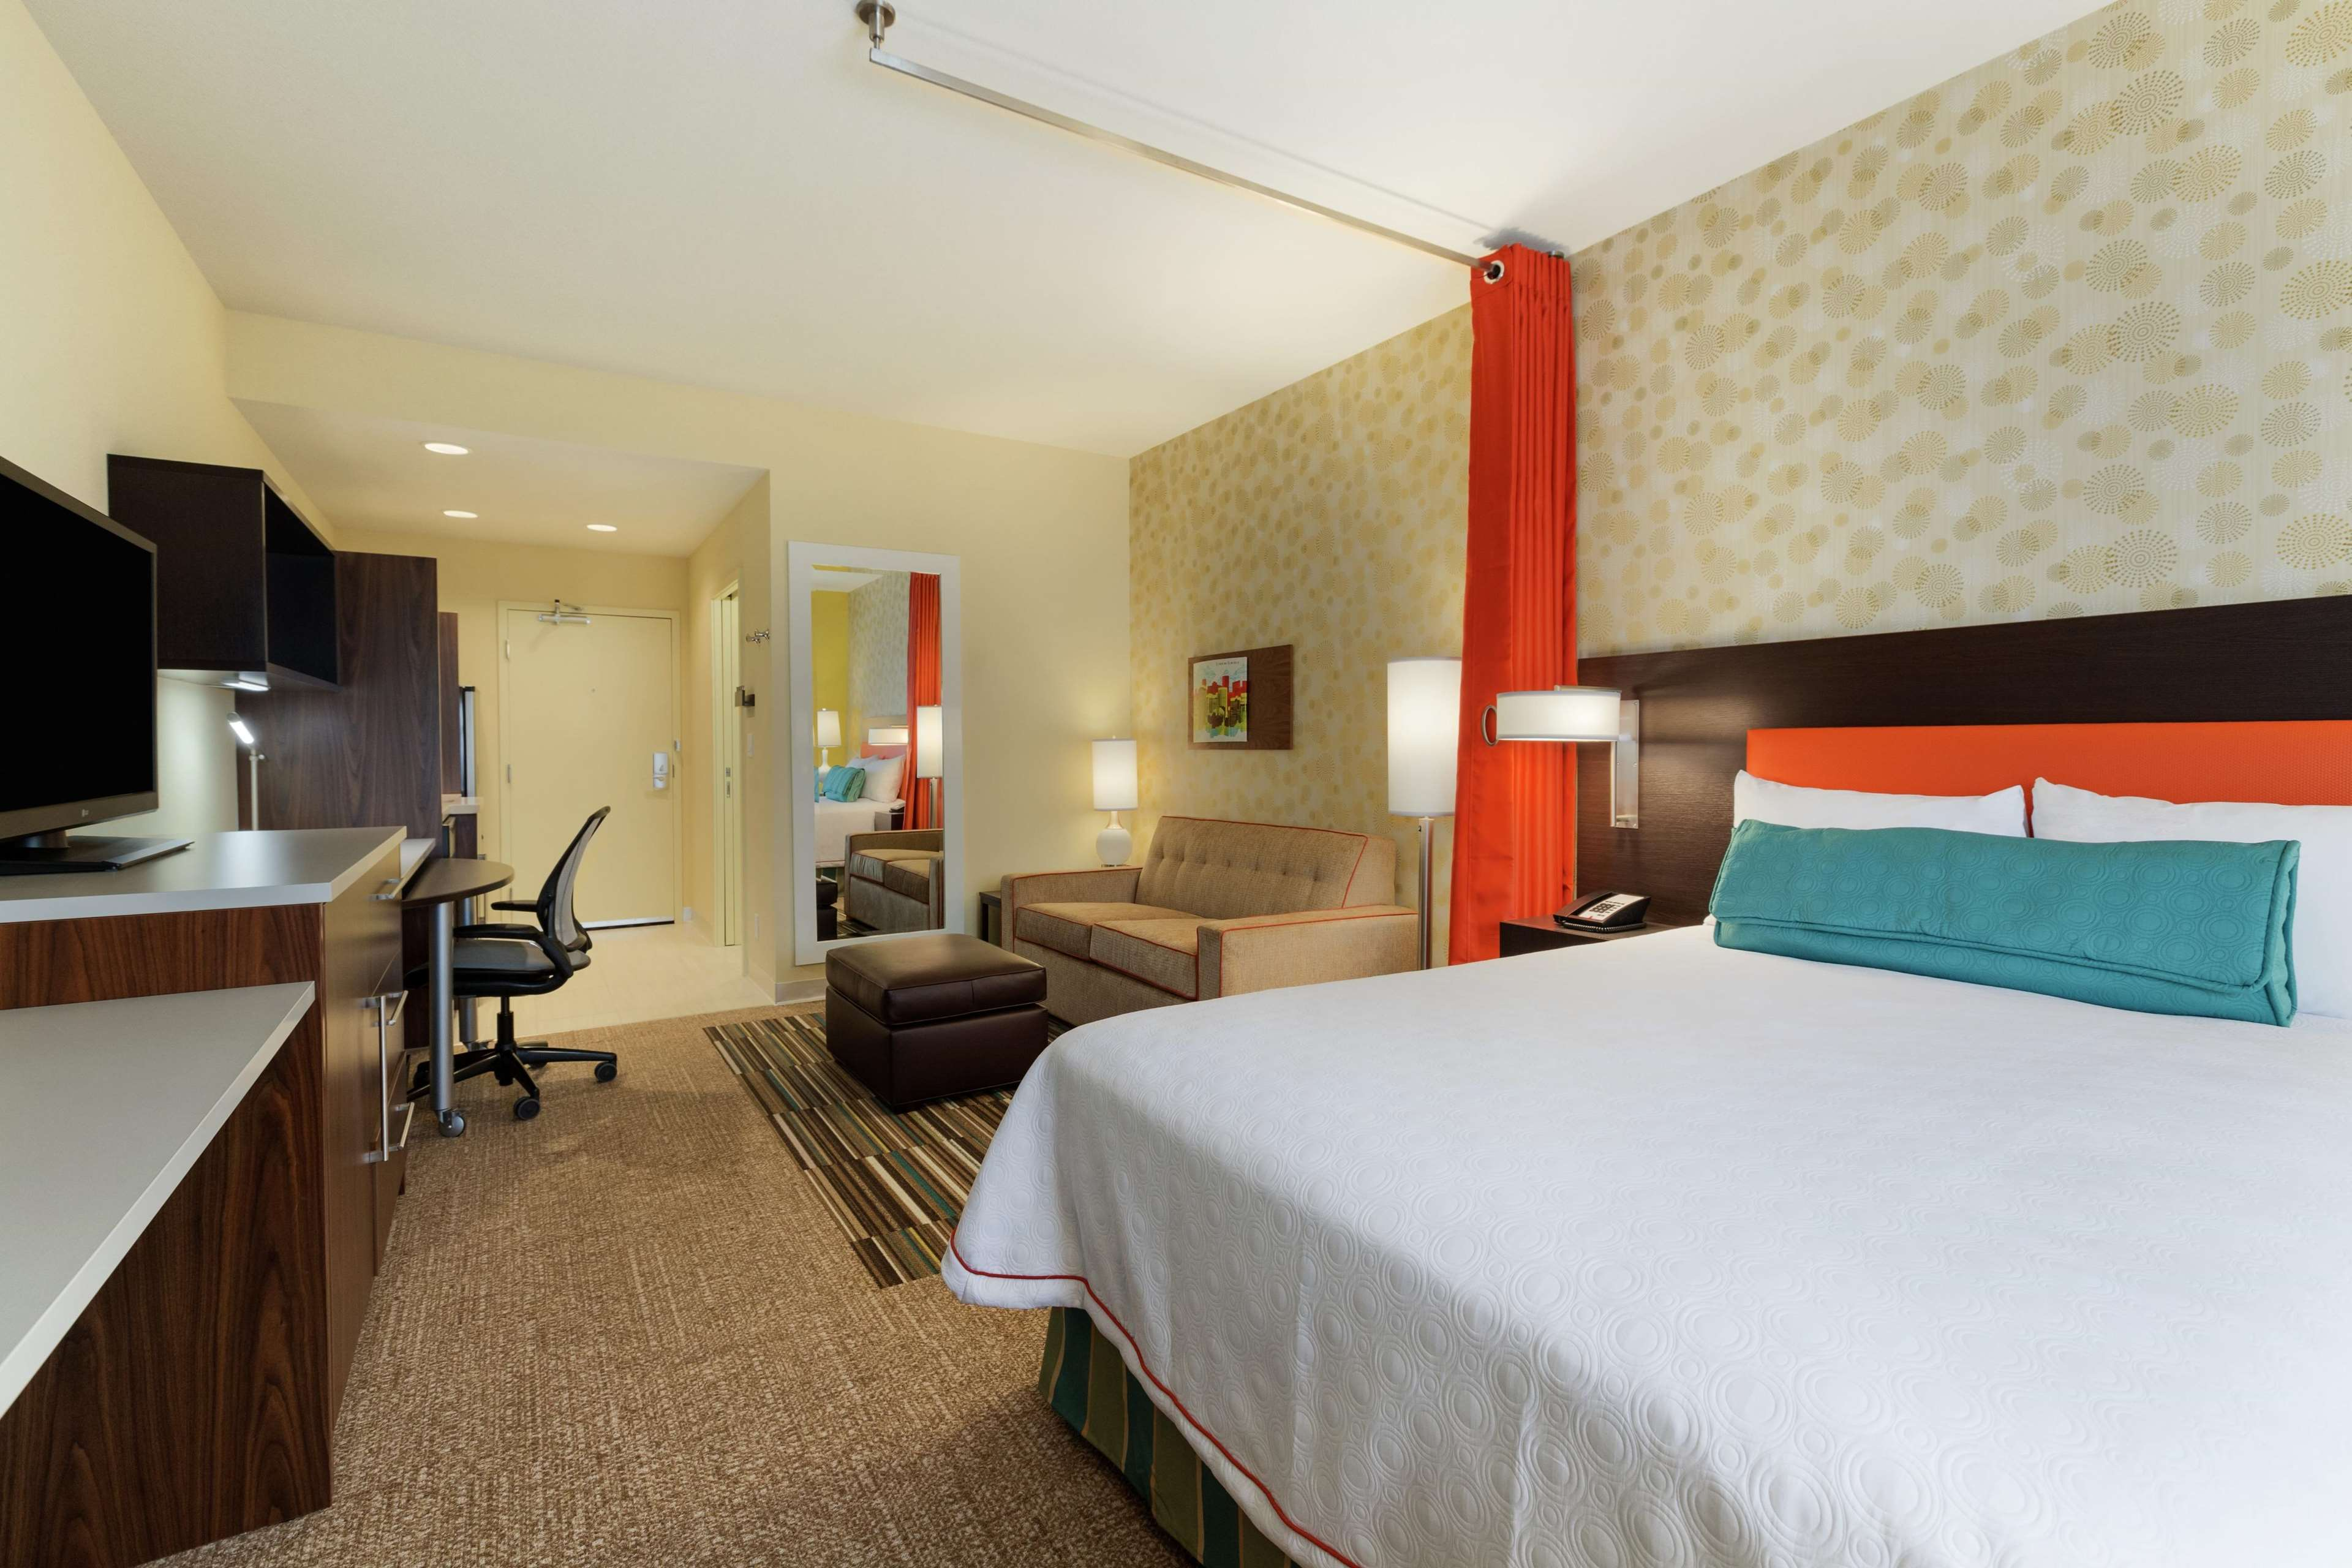 Home2 Suites by Hilton  St. Simons Island image 49